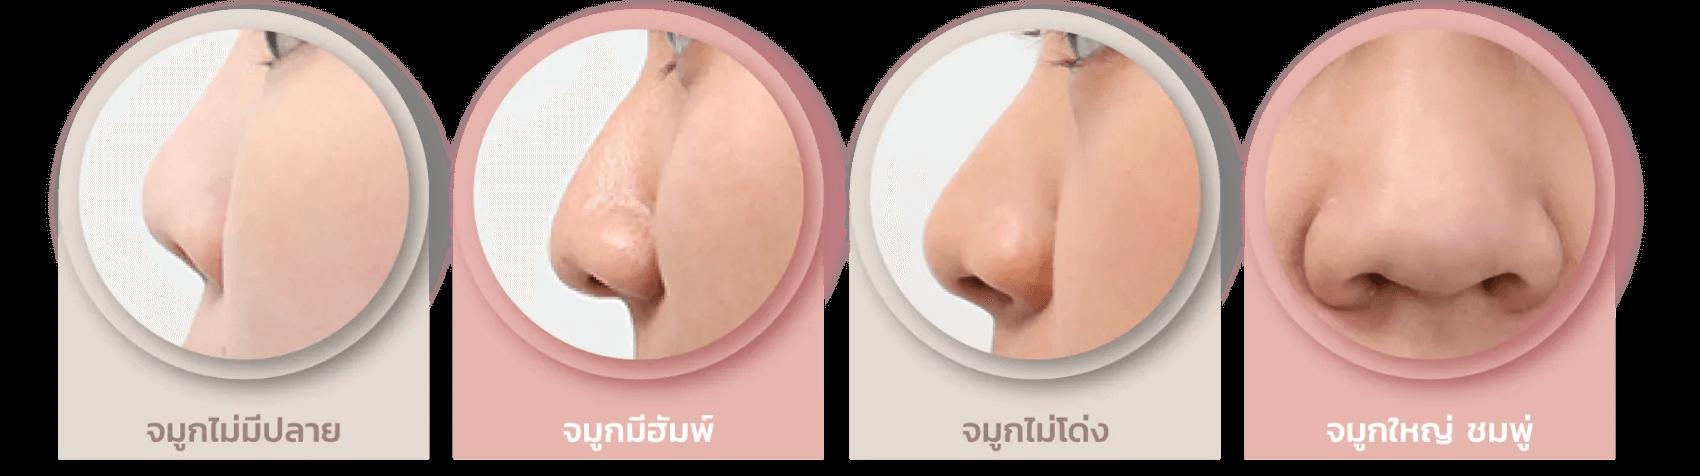 noseclose-01